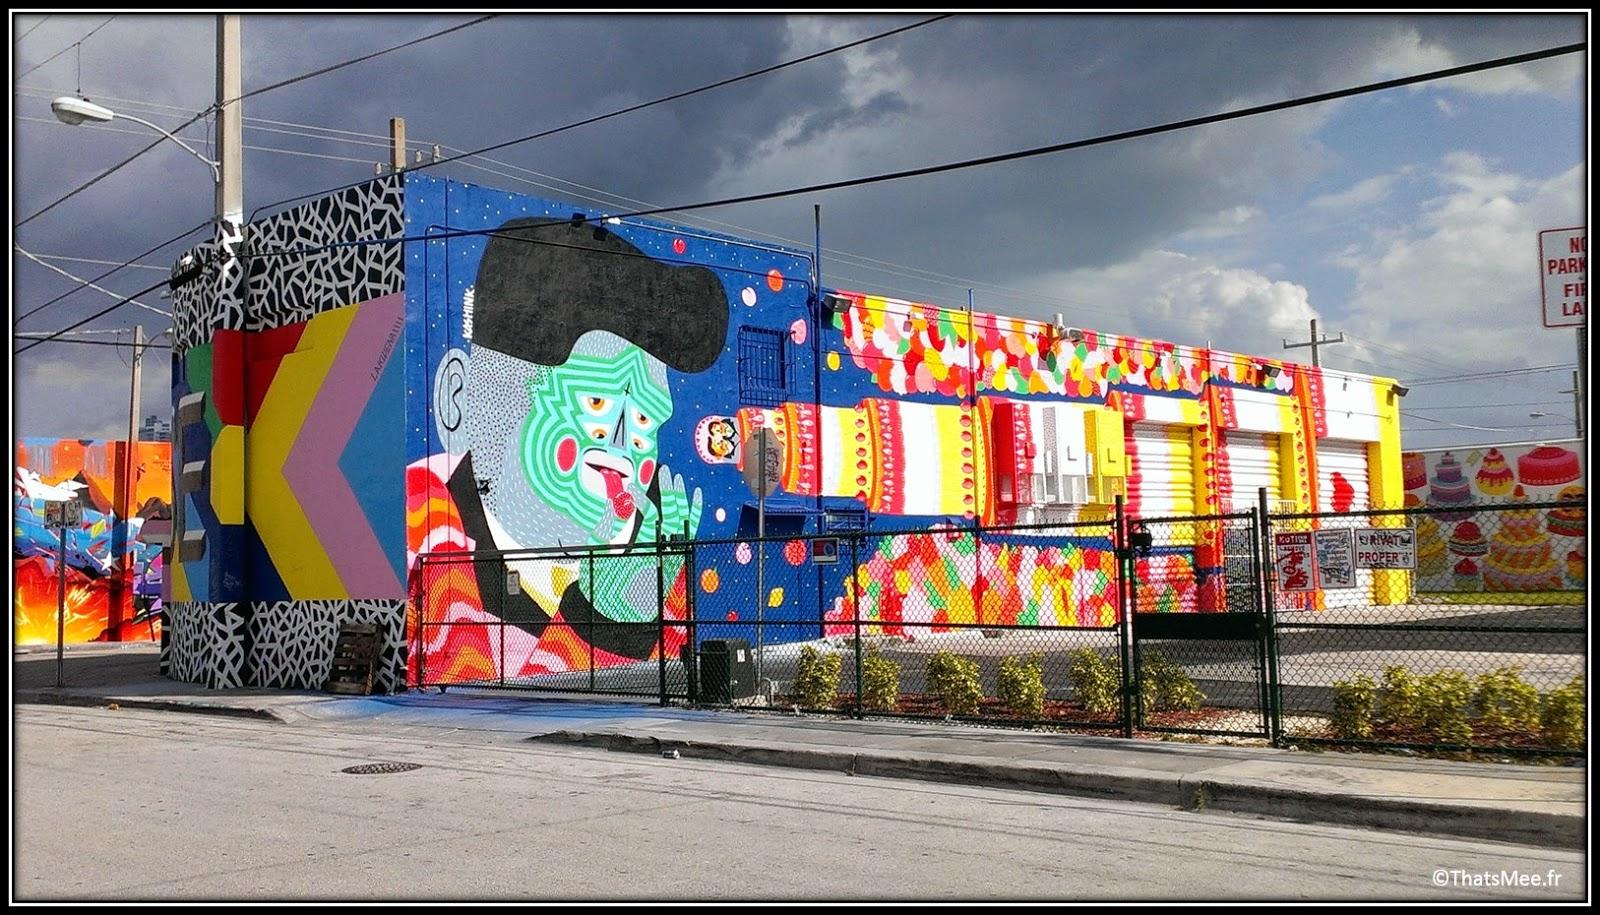 Kashink women street artist Miami Floride Art Basel Wynwood walls, Miami Art Basel 2013